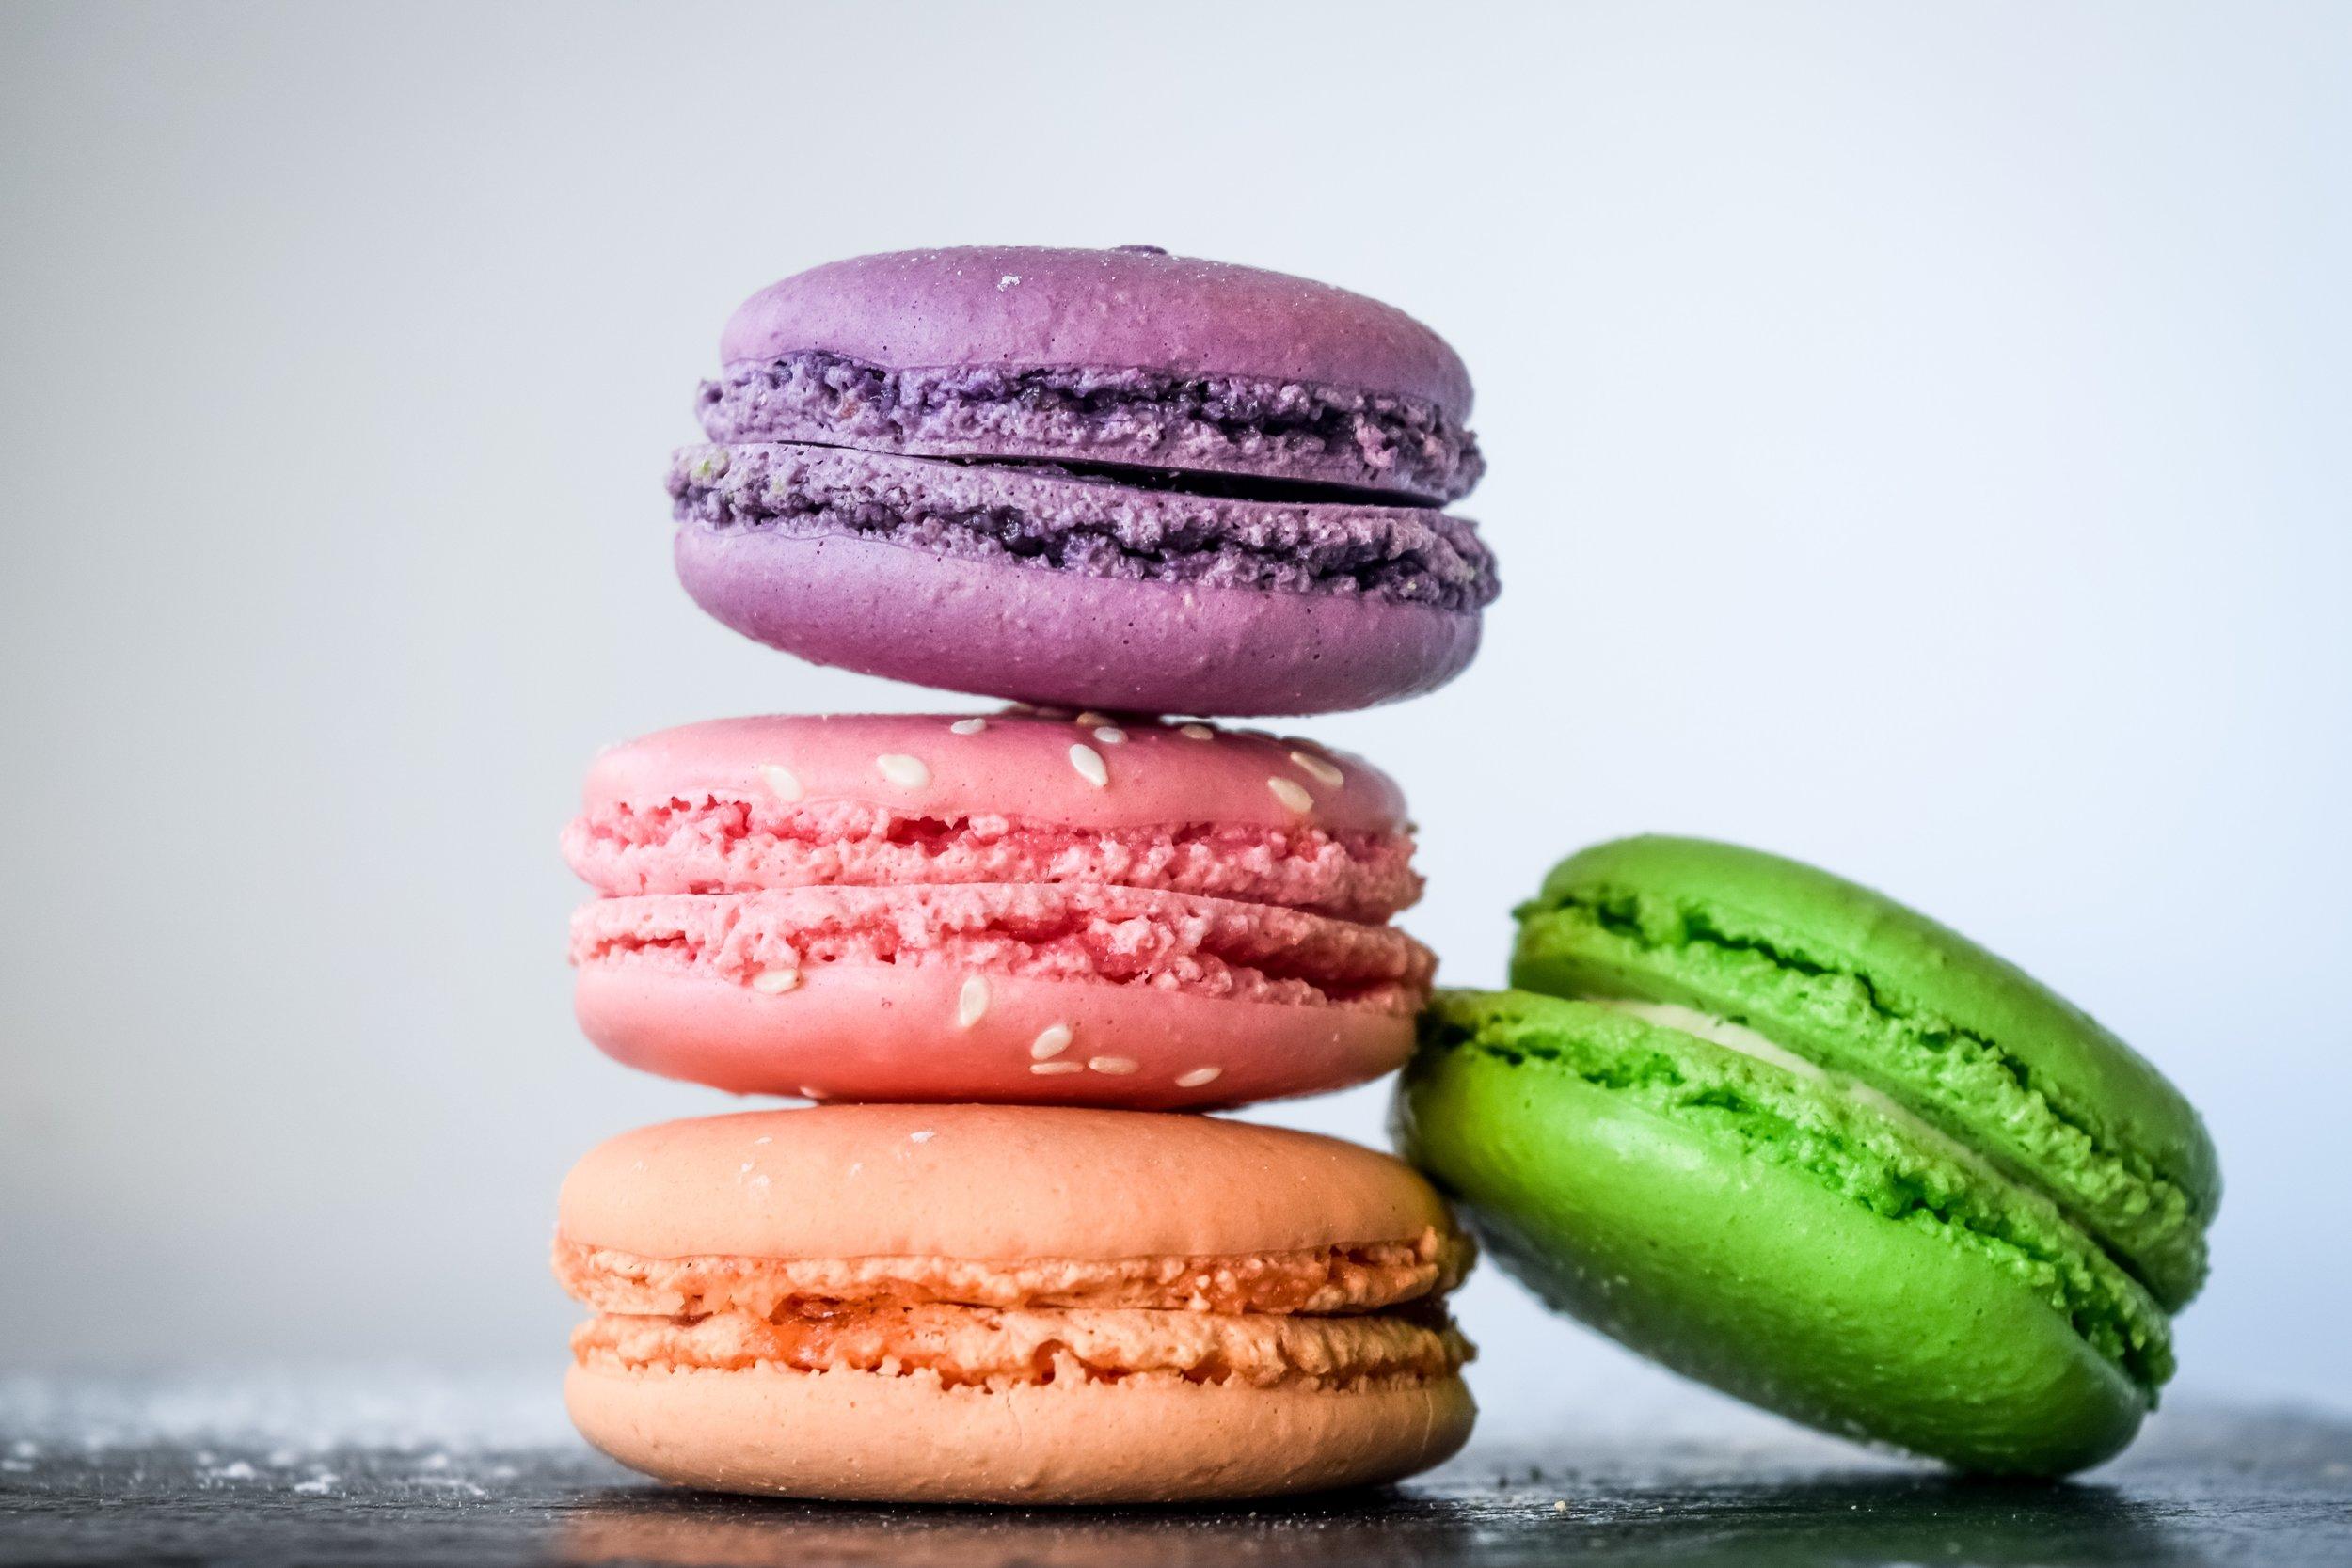 close-up-colors-cookies-808941.jpg